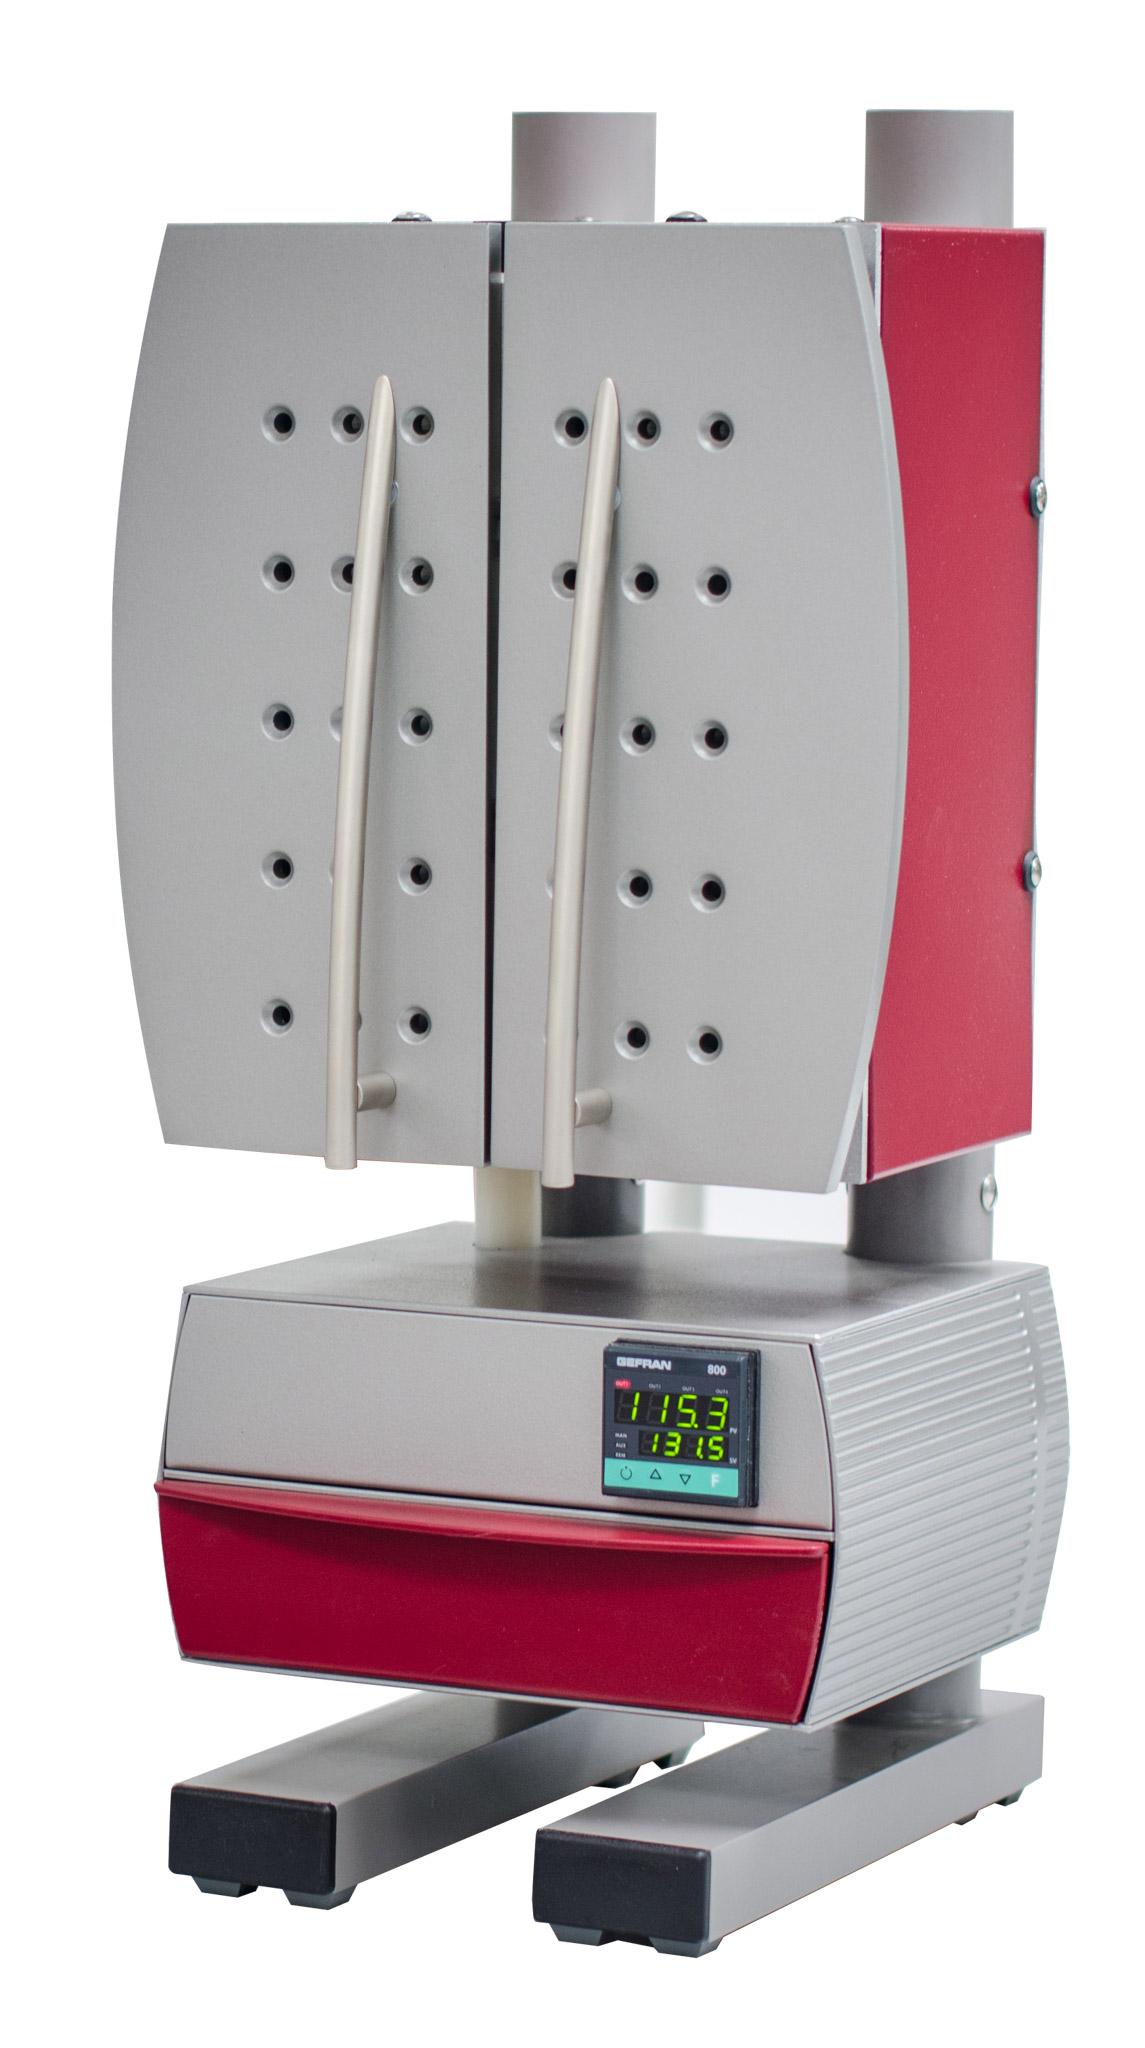 EM-10 Oven